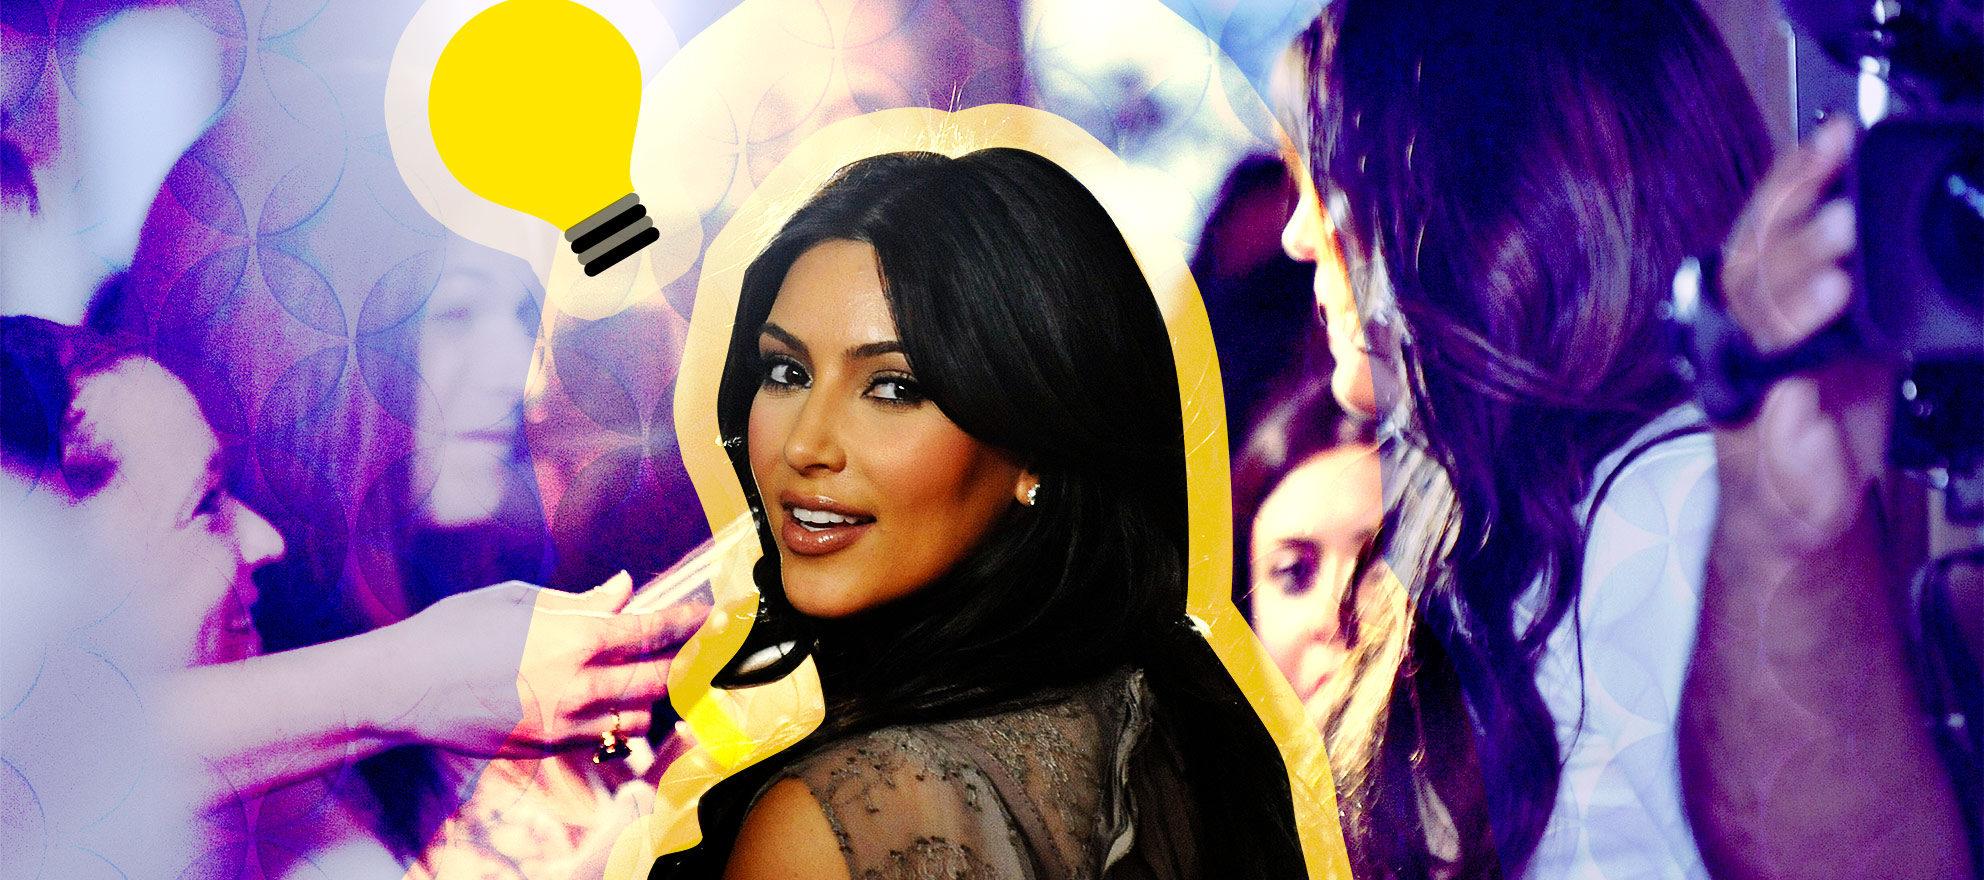 What Kim Kardashian can teach you about social media